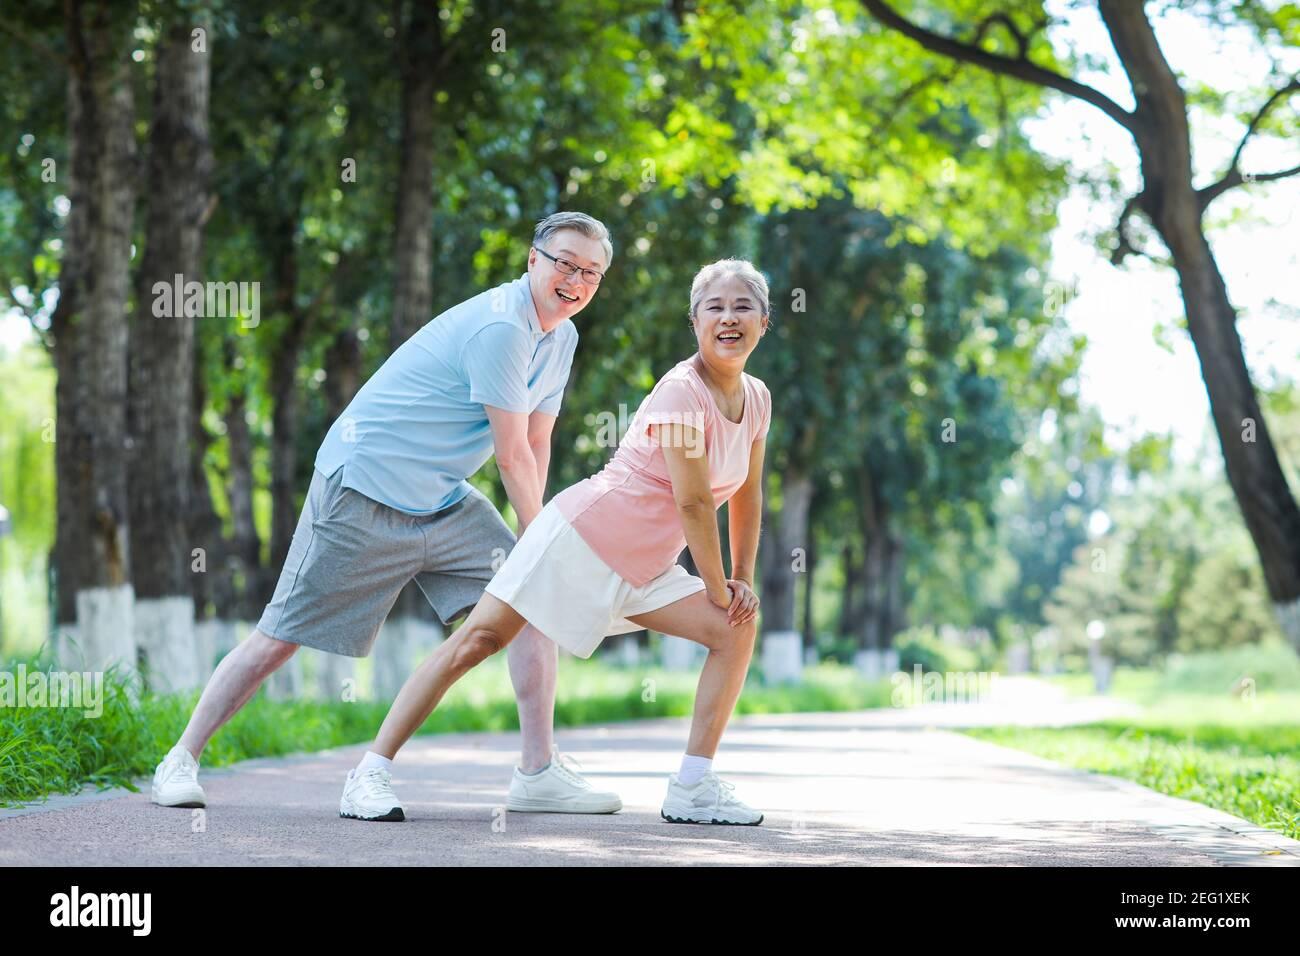 La vieja pareja se divierte en el parque sonriendo Foto de stock